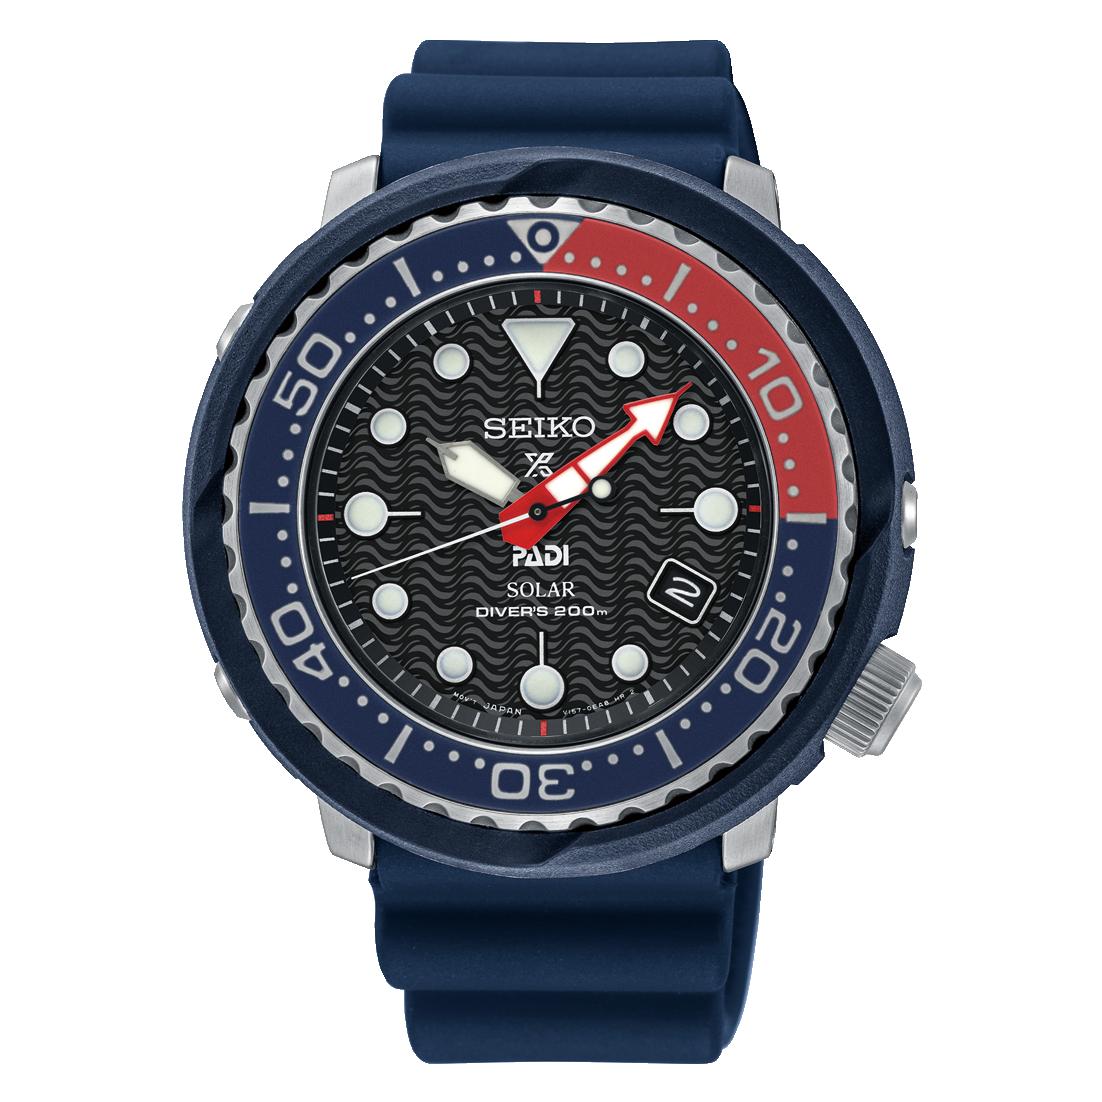 Seiko Seiko horloge Prospex Padi Solar Special Edition SNE499P1